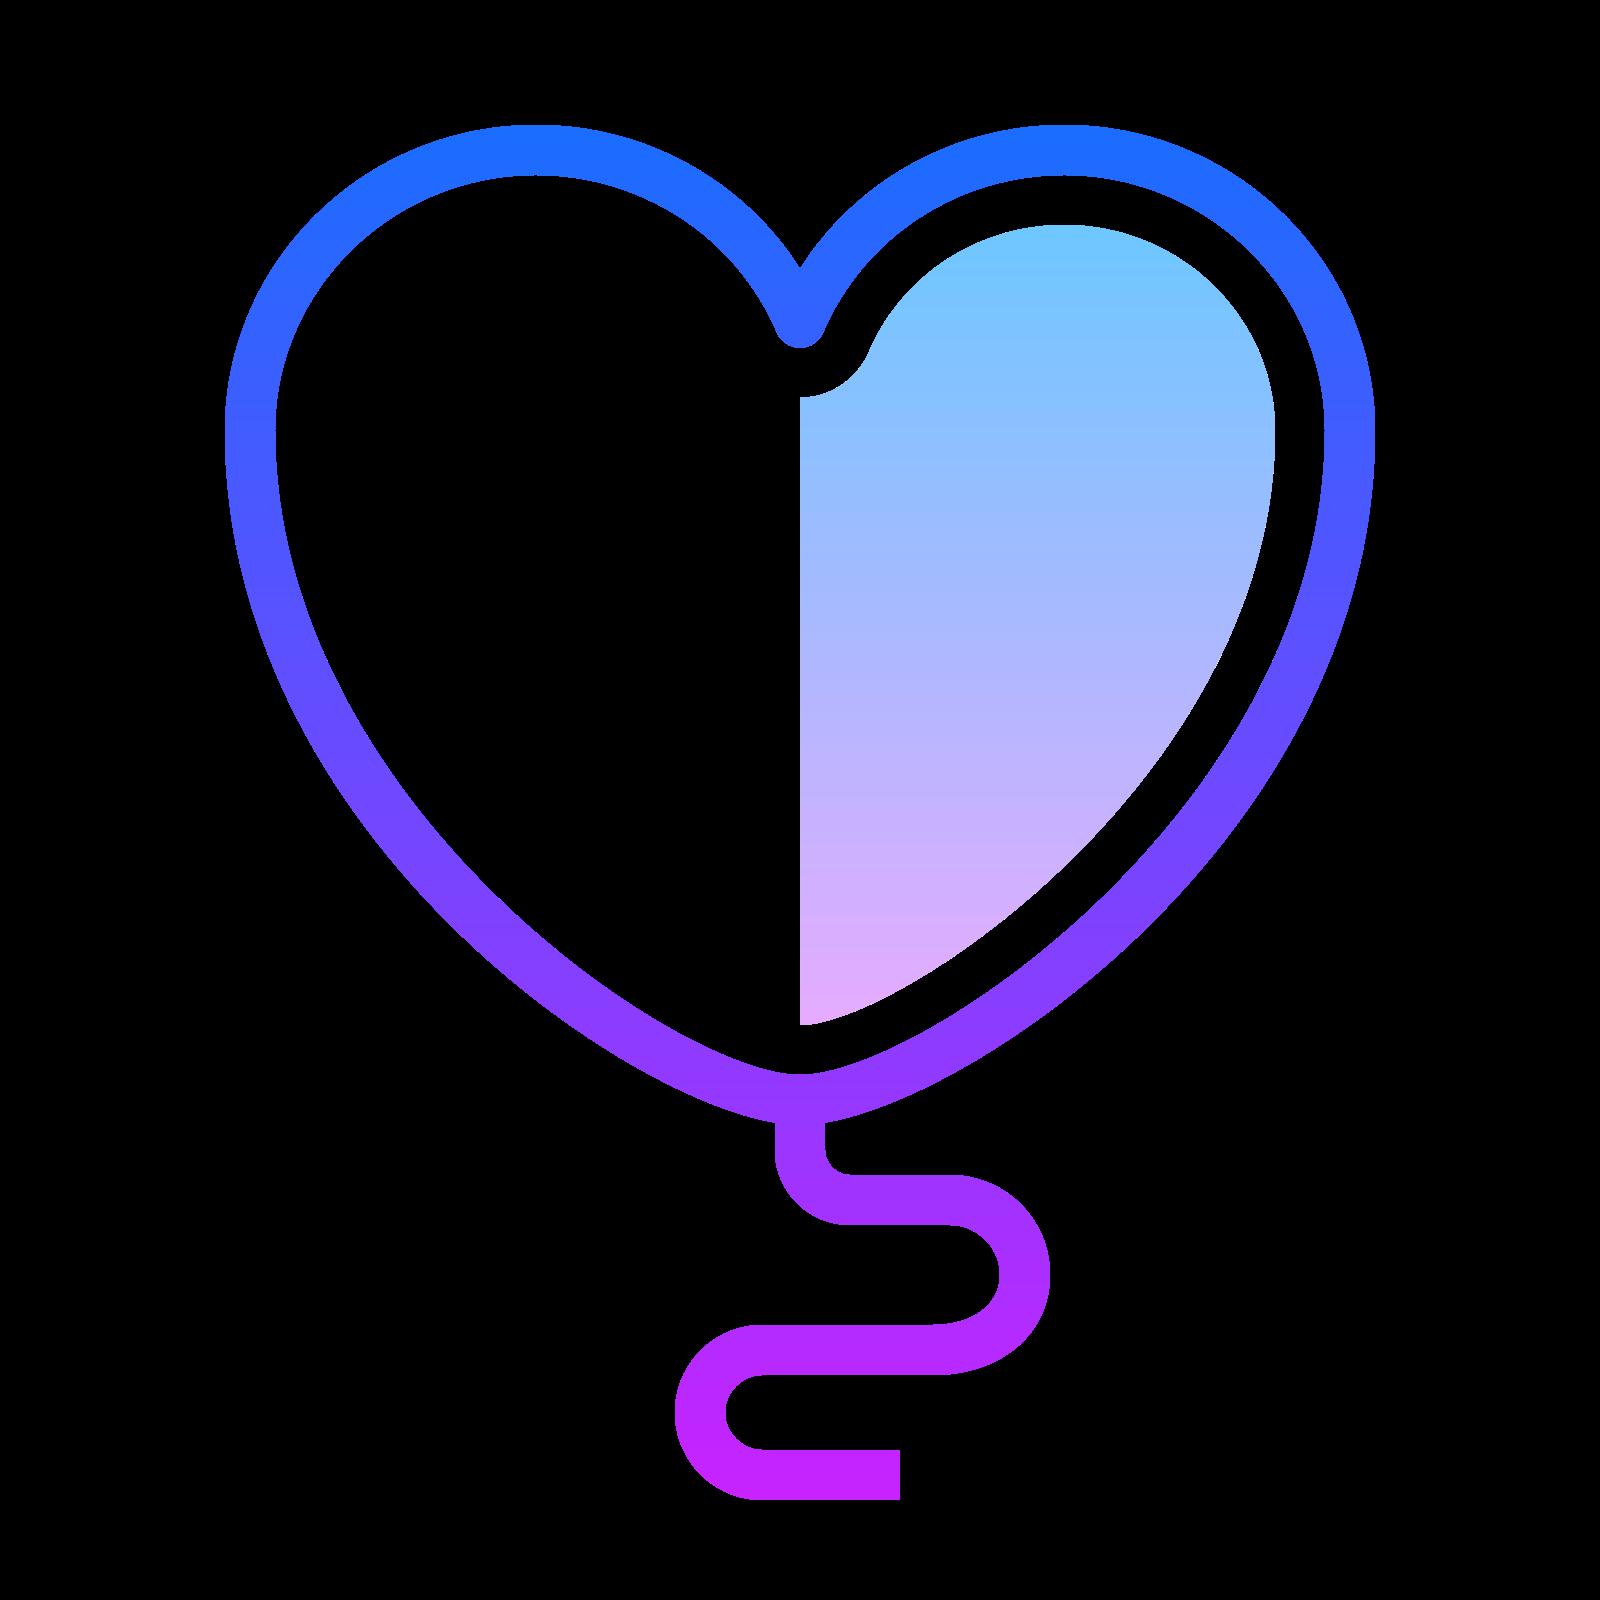 Globo de corazón icon